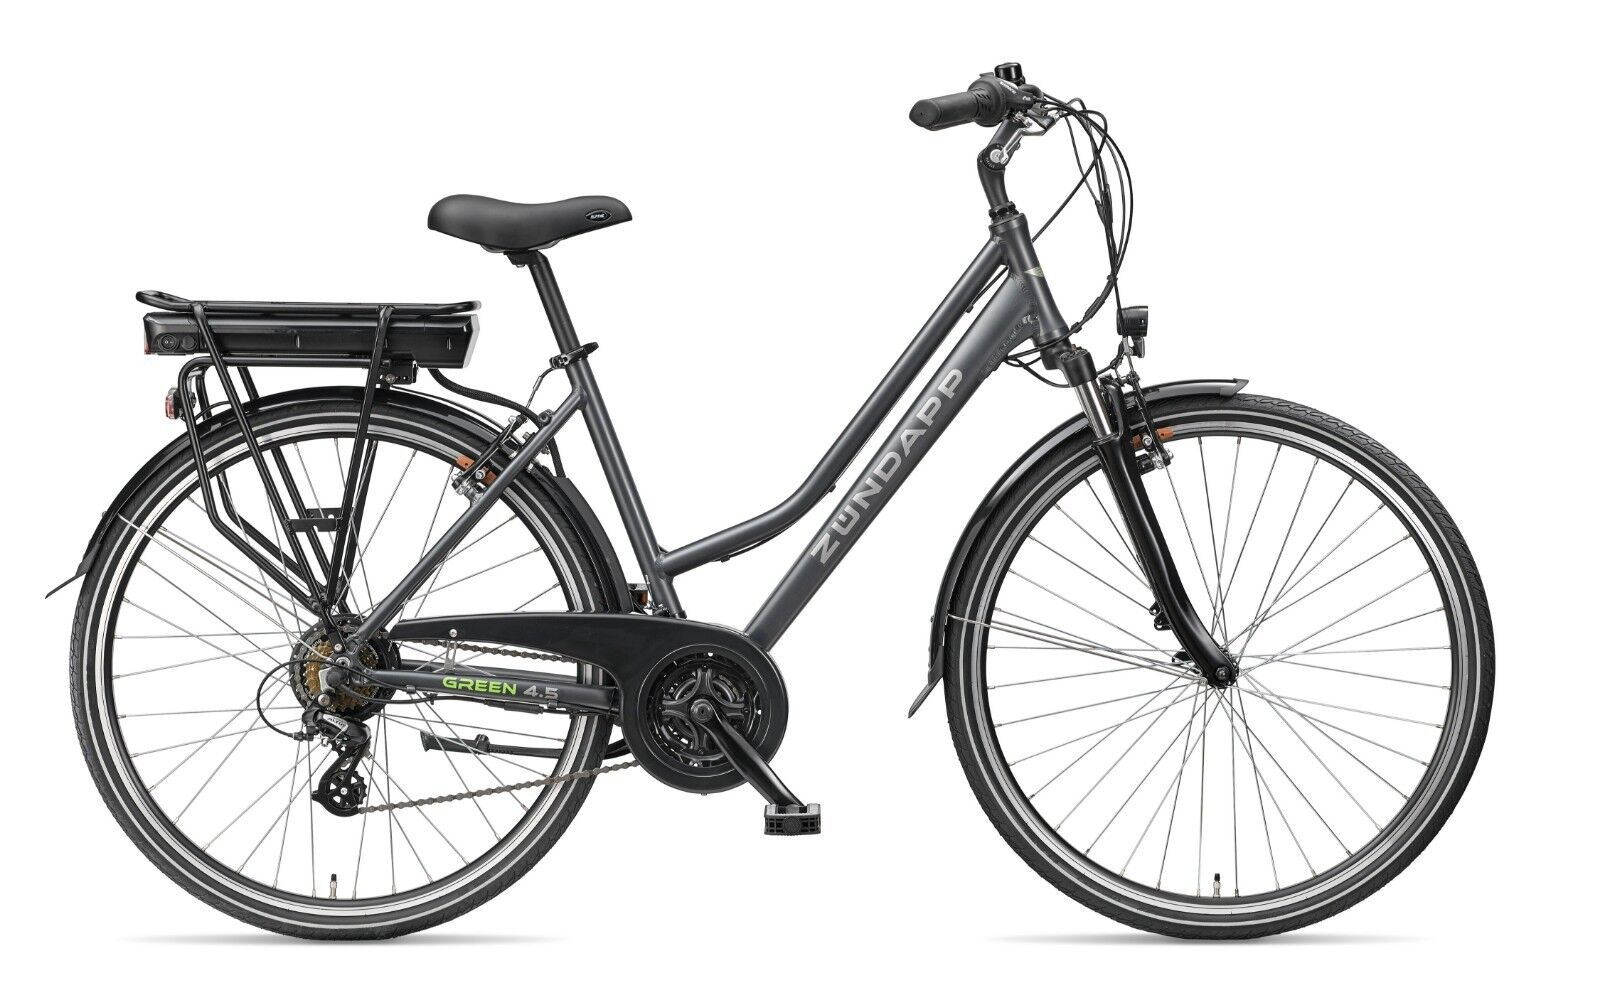 Zündapp E-Bike 28 Zoll Damen Elektrofahrrad 21-Gang Trekking Pedelec - Green 4.5